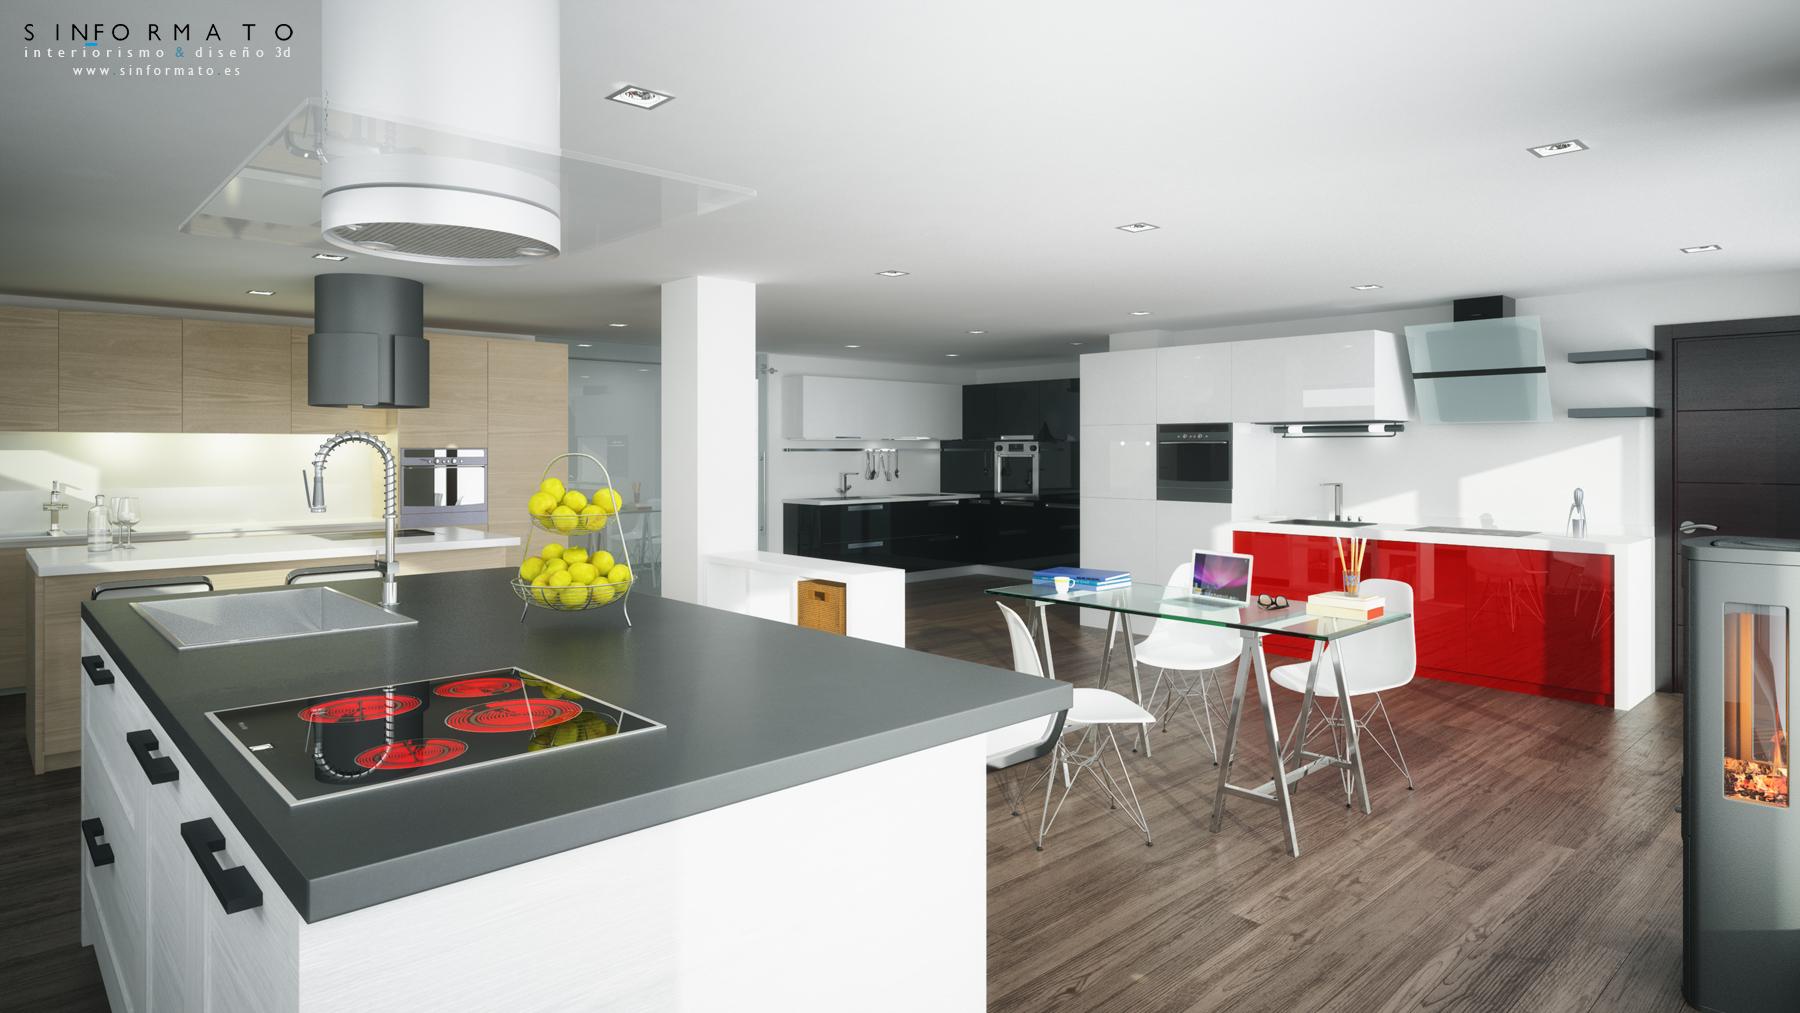 Interiorismo showroom cocinas disenove sin formato - Forma interiorismo ...